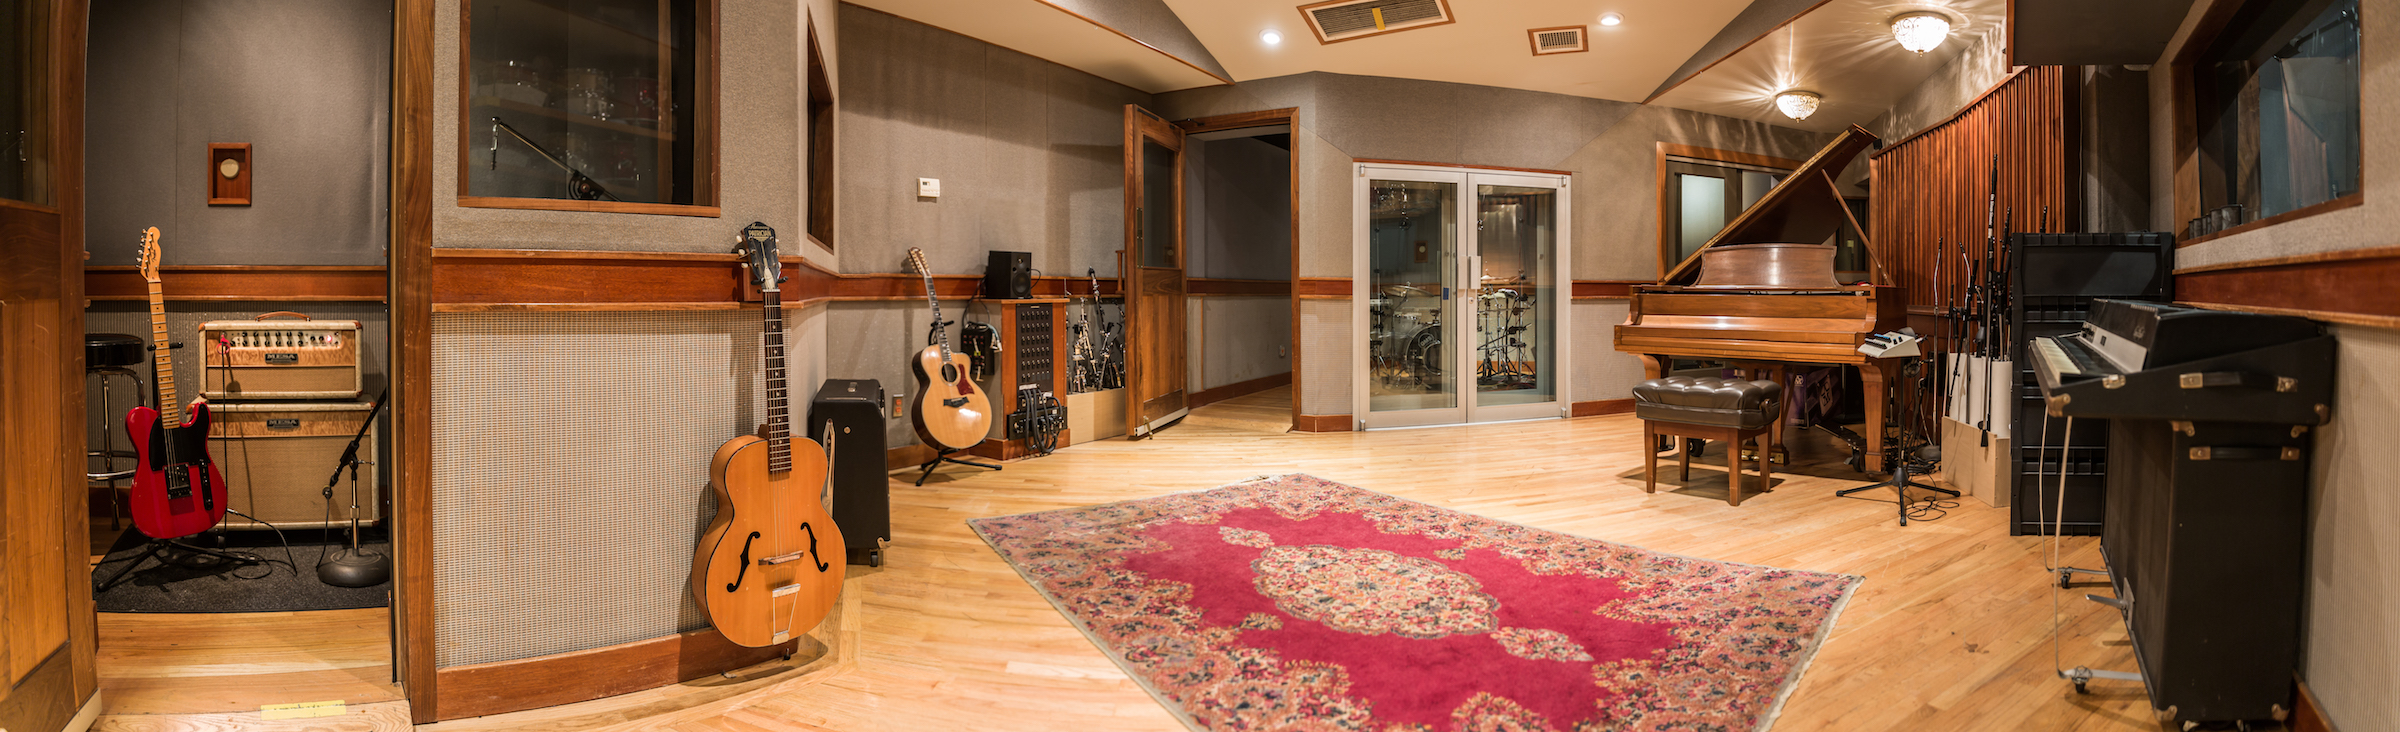 A-Studio-live-room_2018-03_color_2400x732.jpg